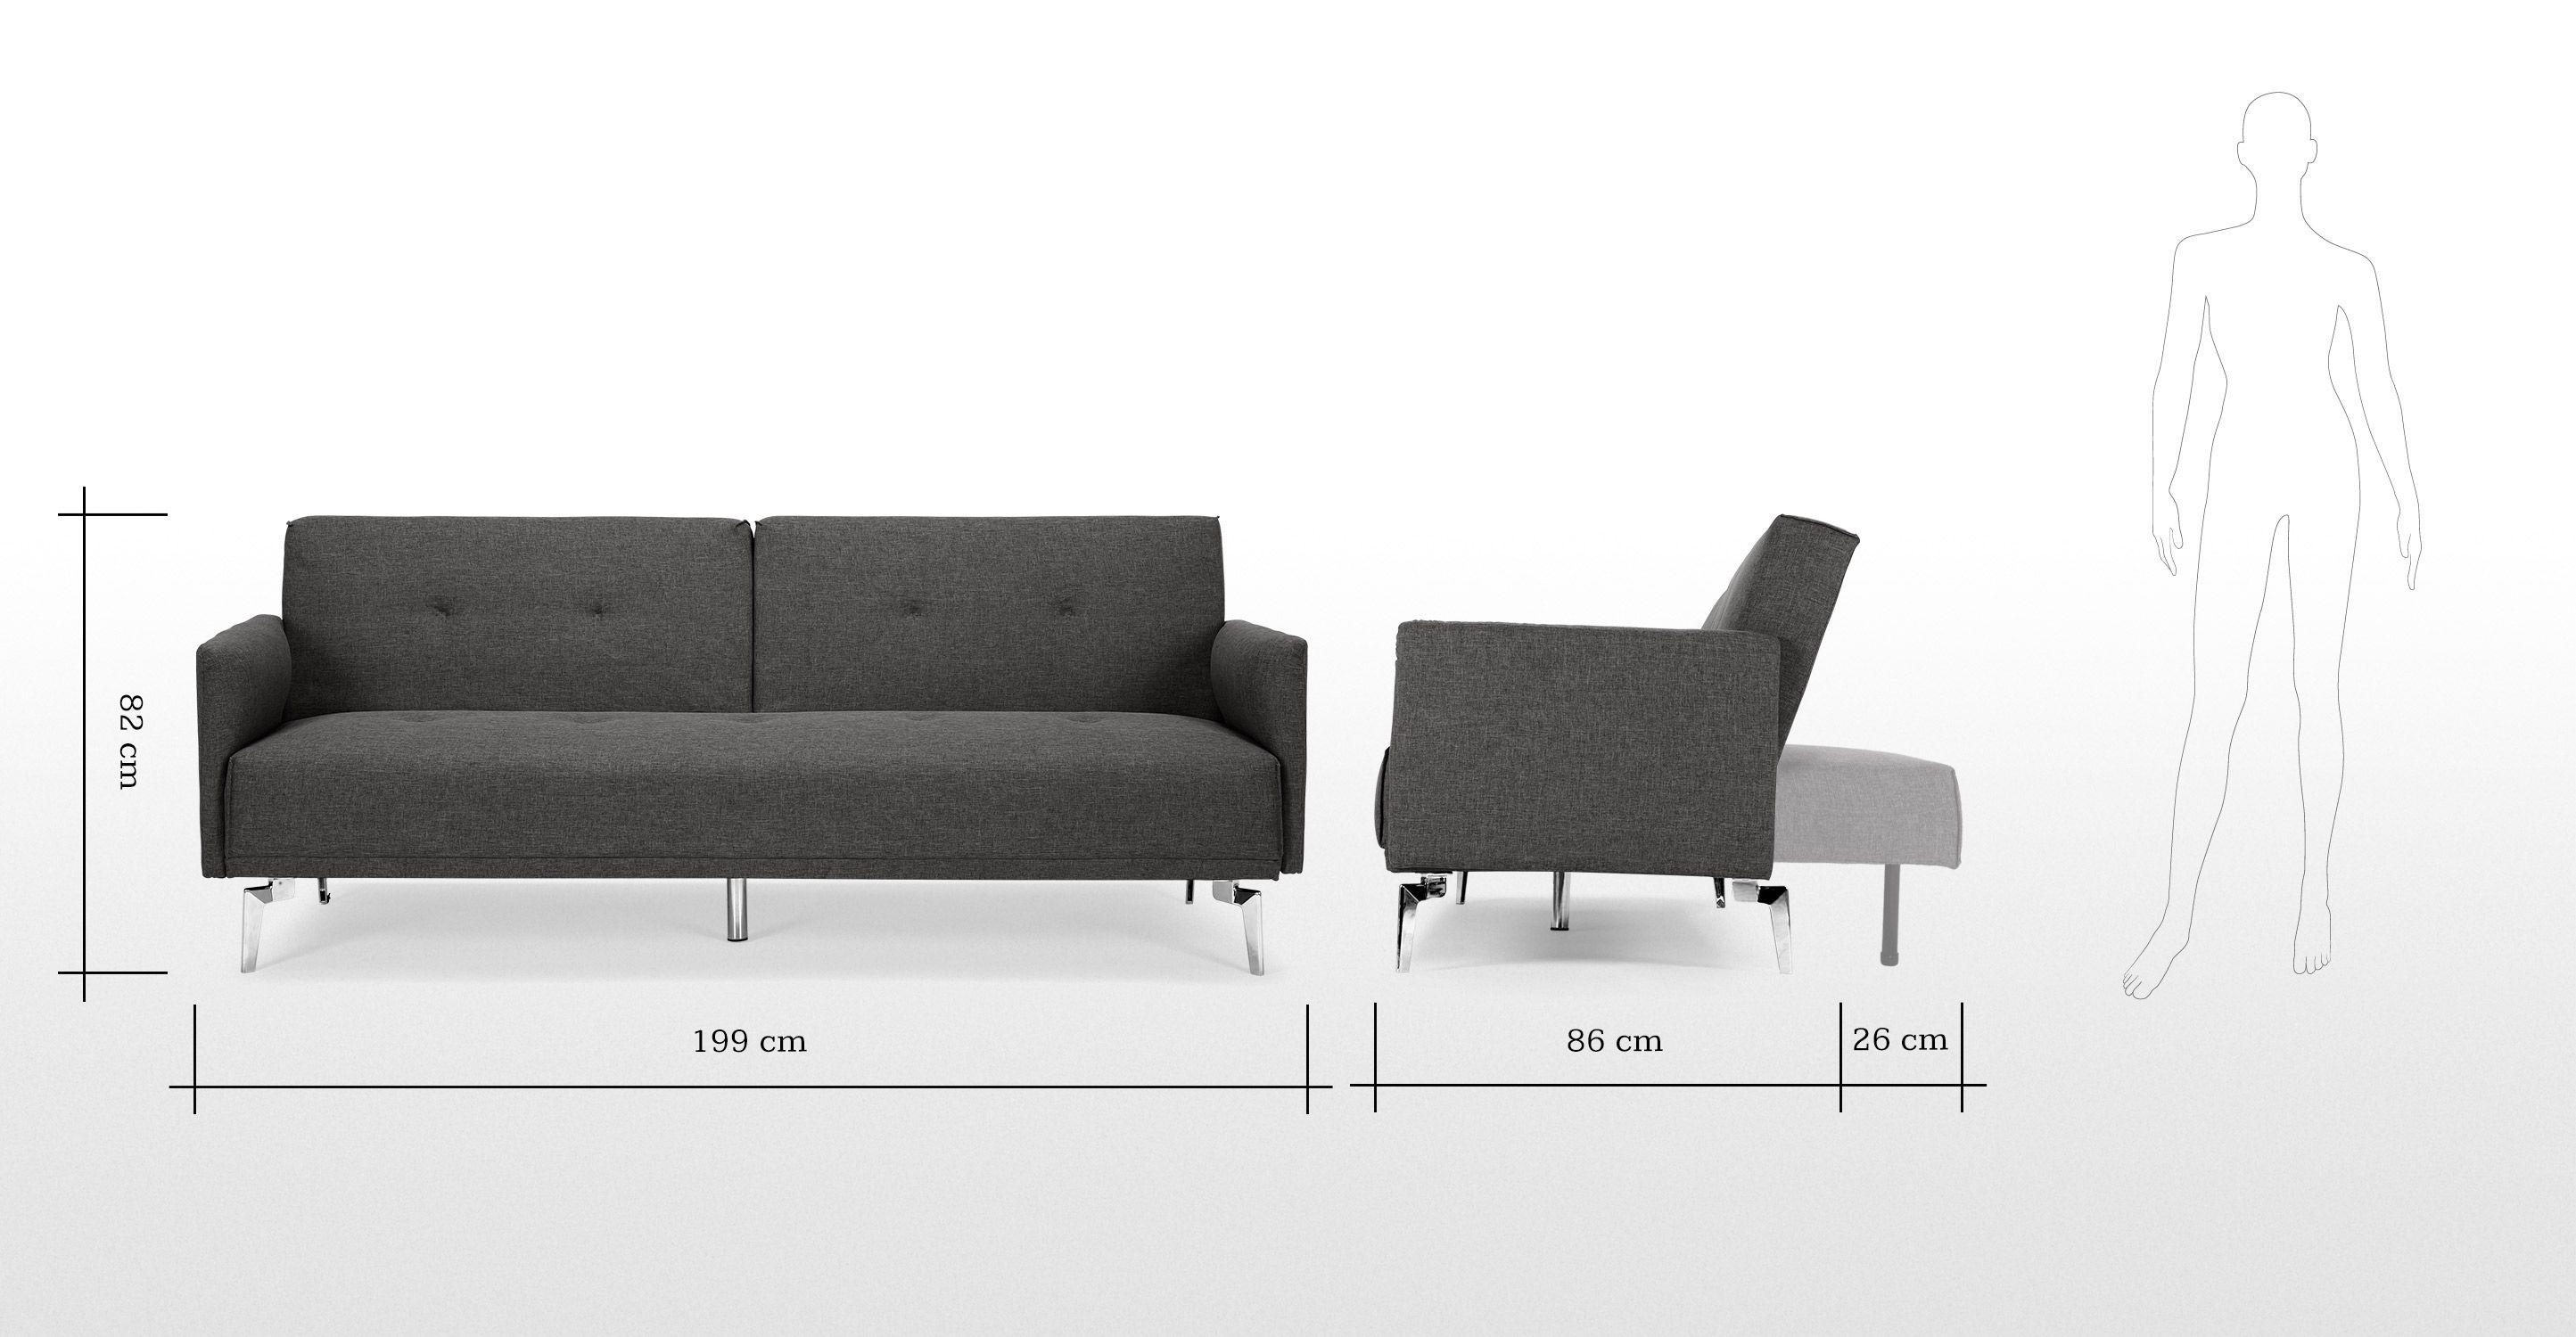 Akio Canape Convertible Gris Taupe Grey Sofa Bed Sofa Bed Sofa